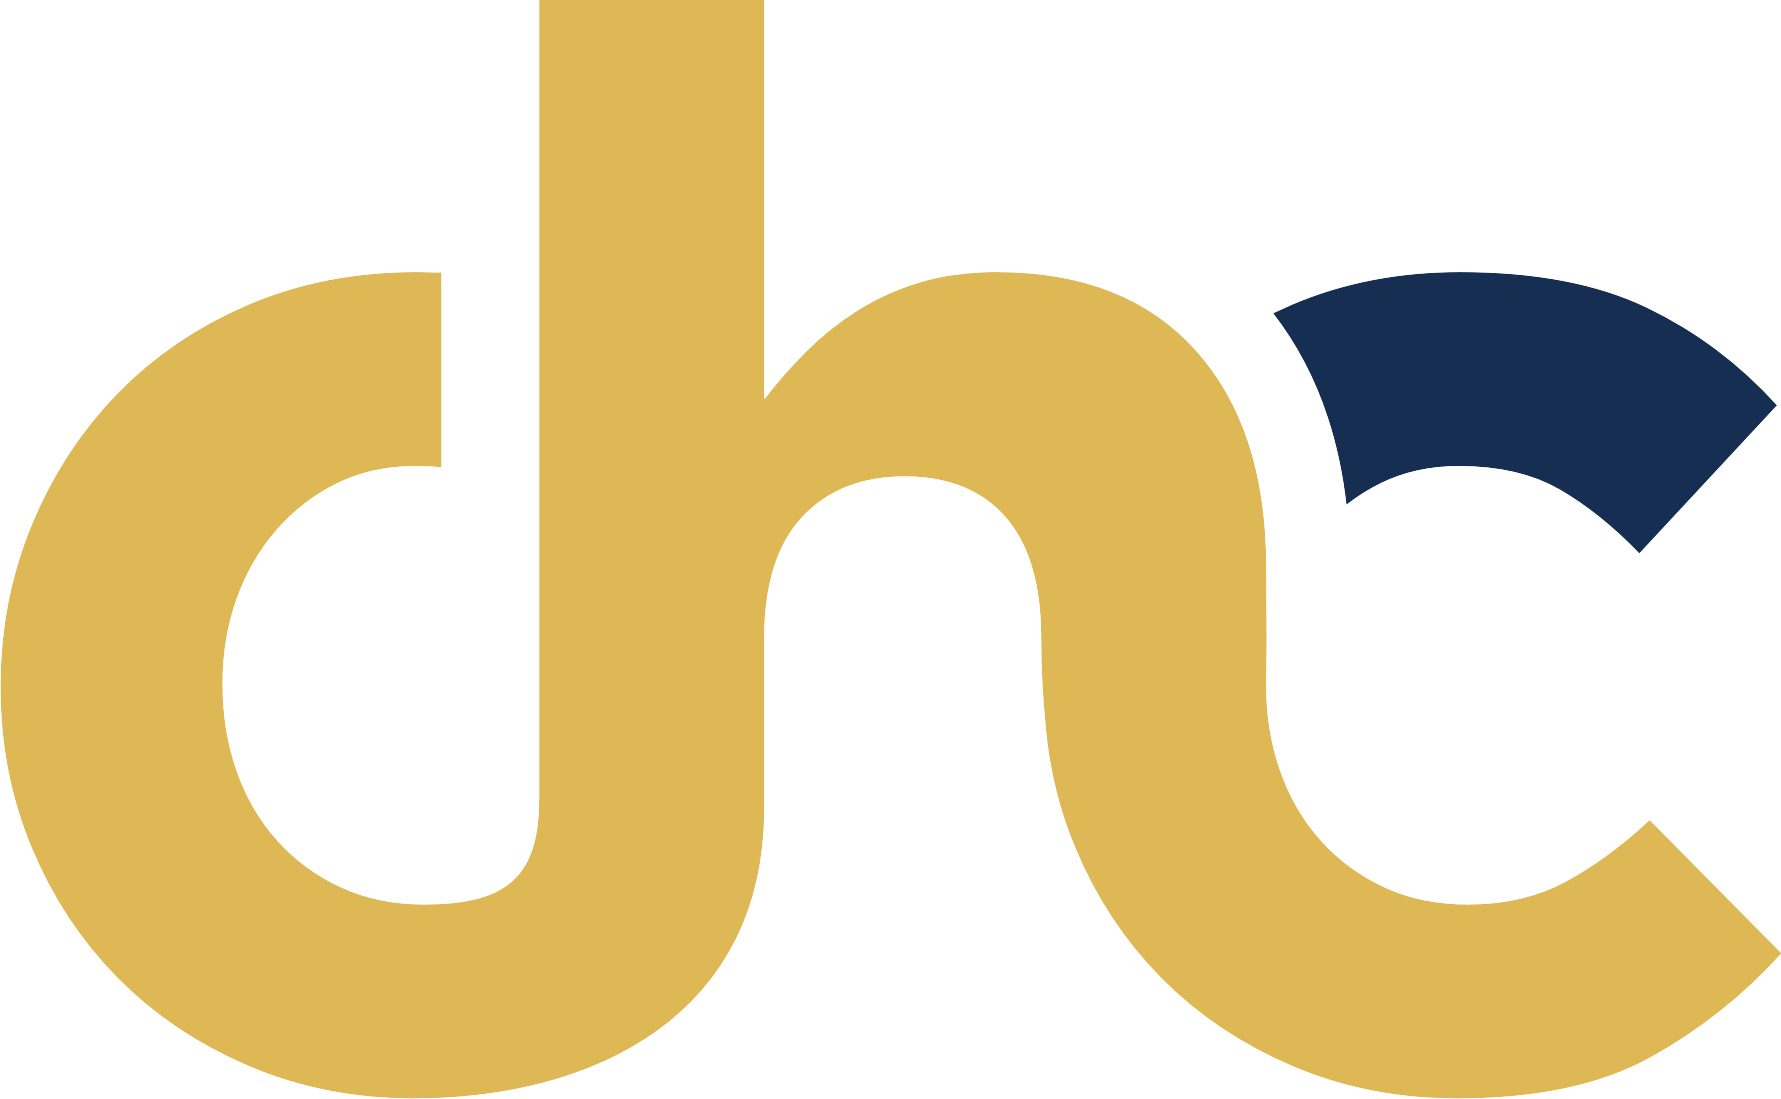 logo CHC gold blue